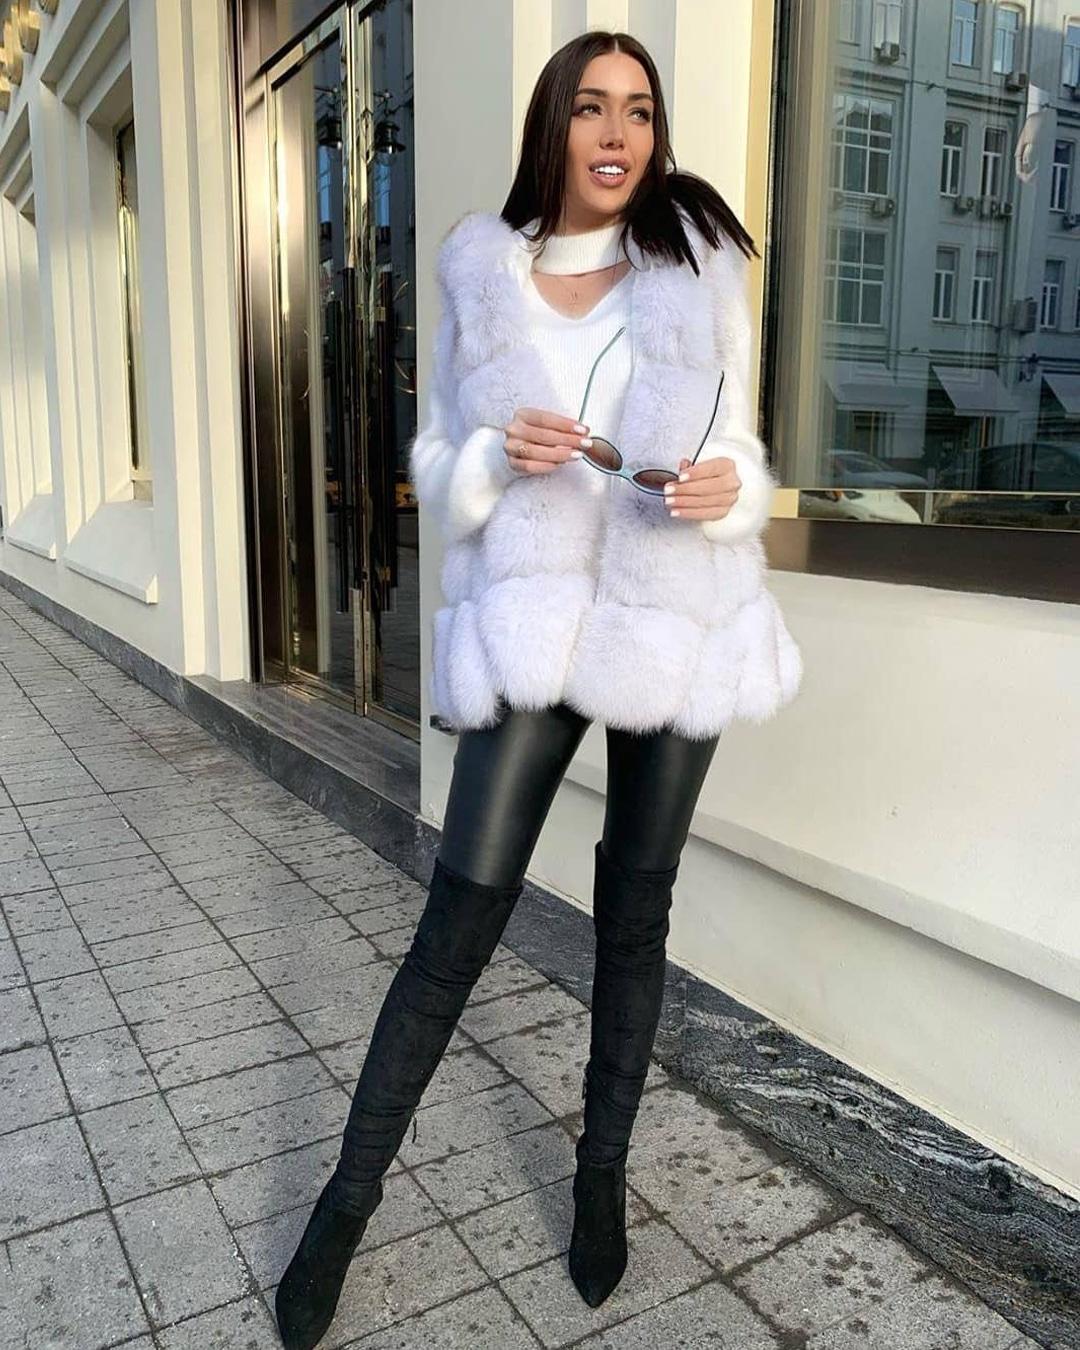 gail-white-tanechka_milay-1